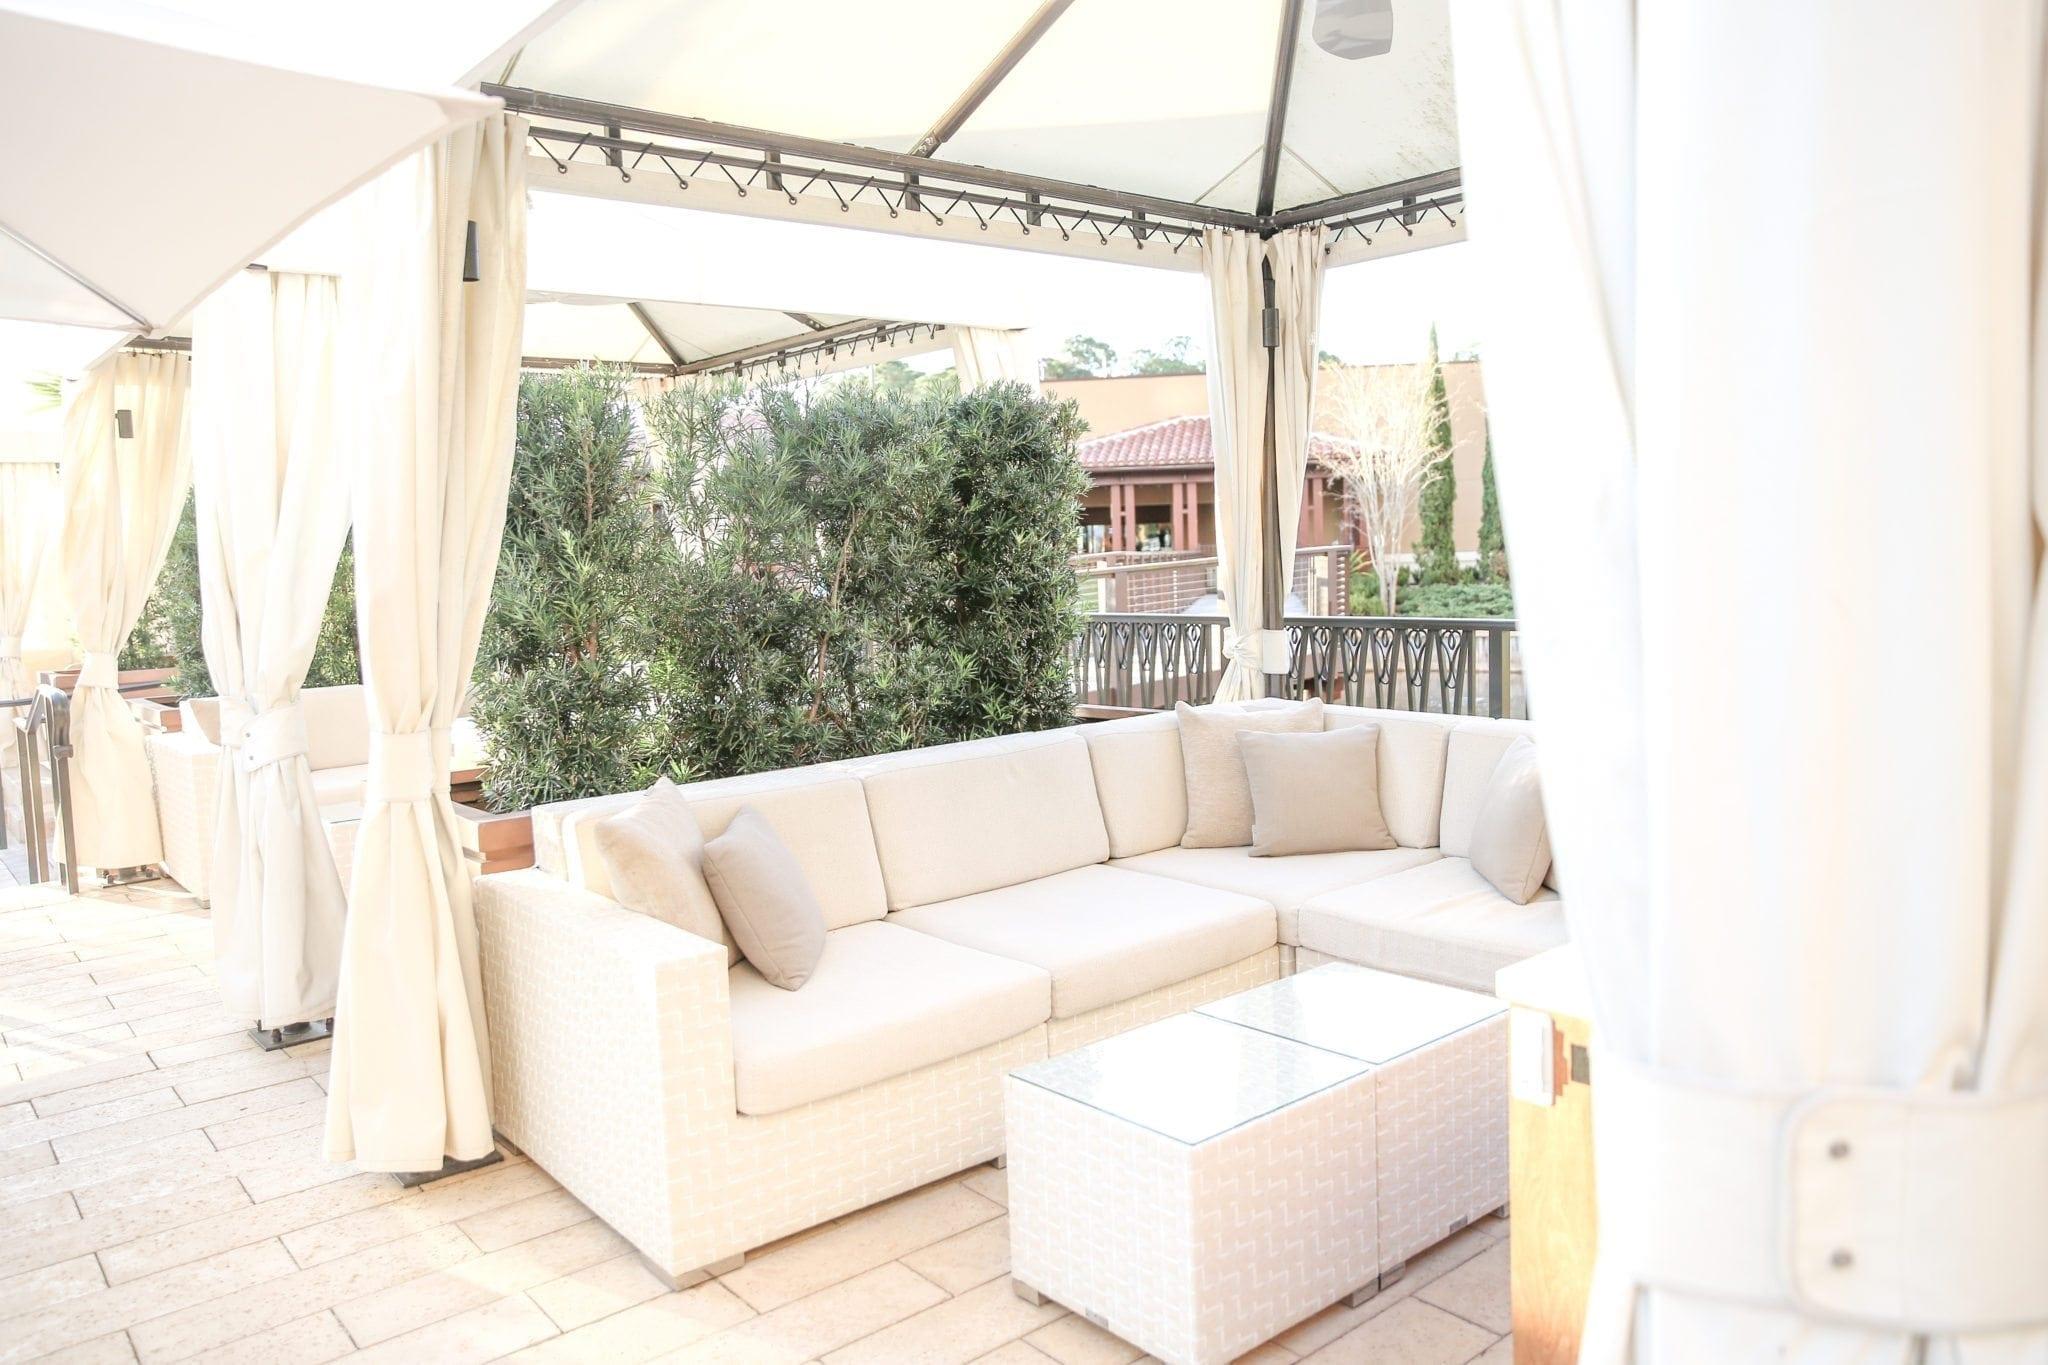 cabana couches at four seasons orlando pools